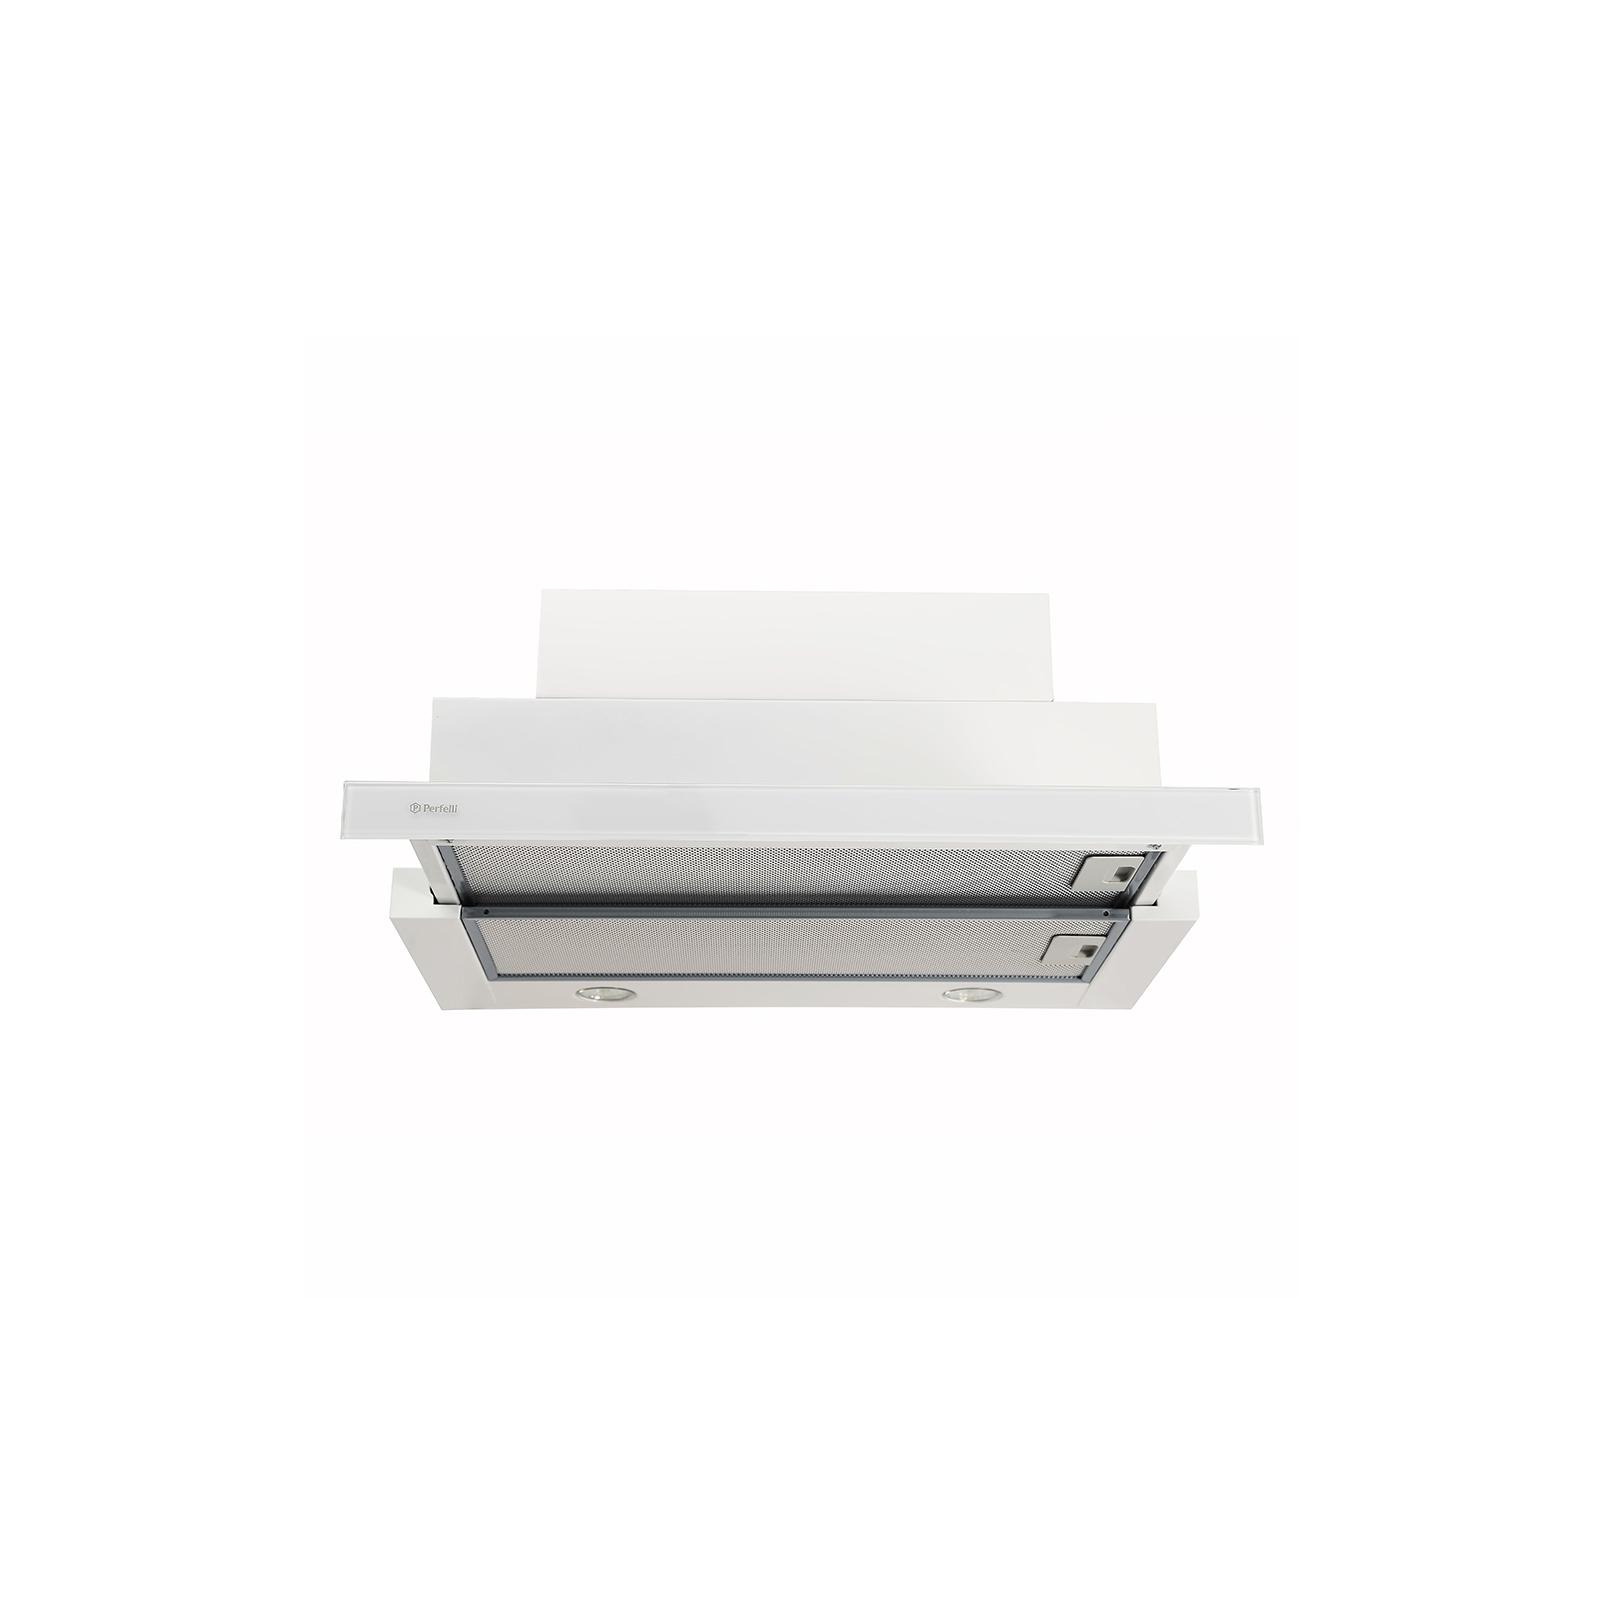 Вытяжка кухонная PERFELLI TLS 6832 W LED изображение 2